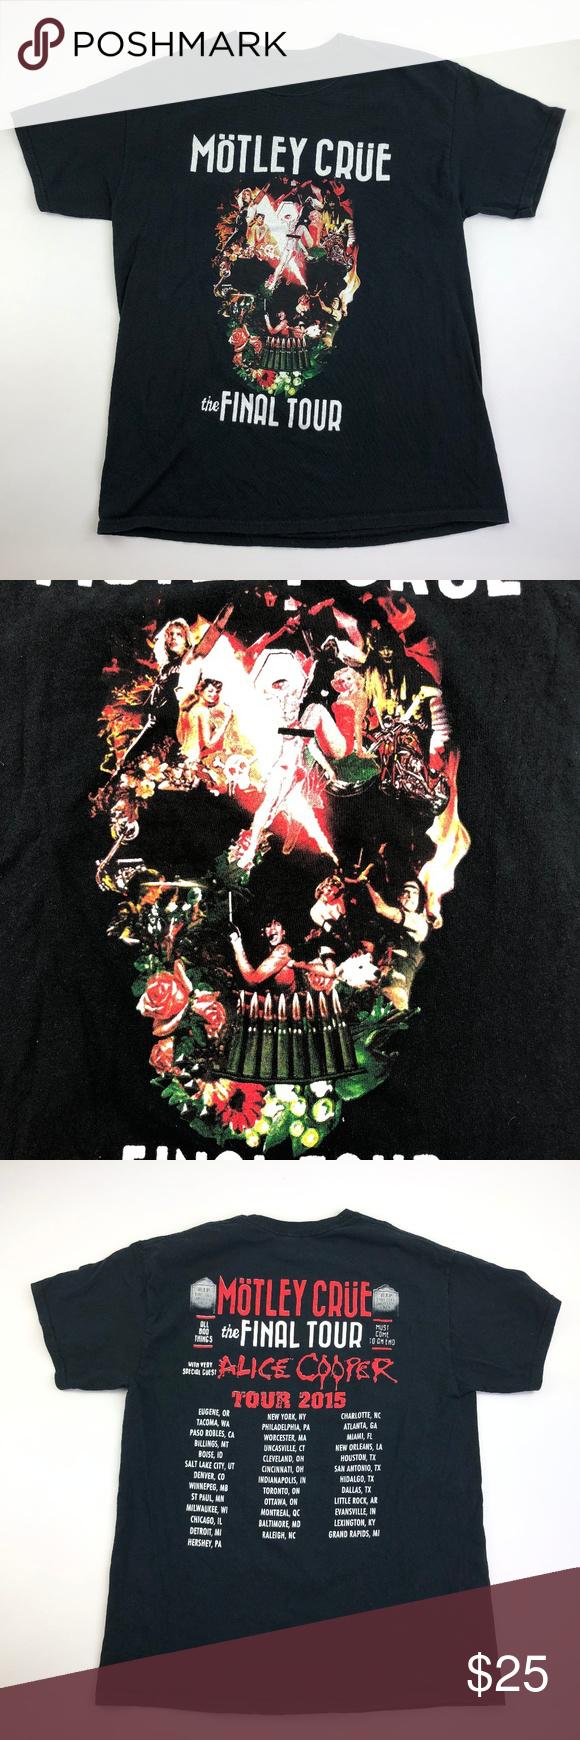 Motley Crue Concert Tee The Last Tour 2015 Motley Crue Concert Concert Tees Concert Tshirts